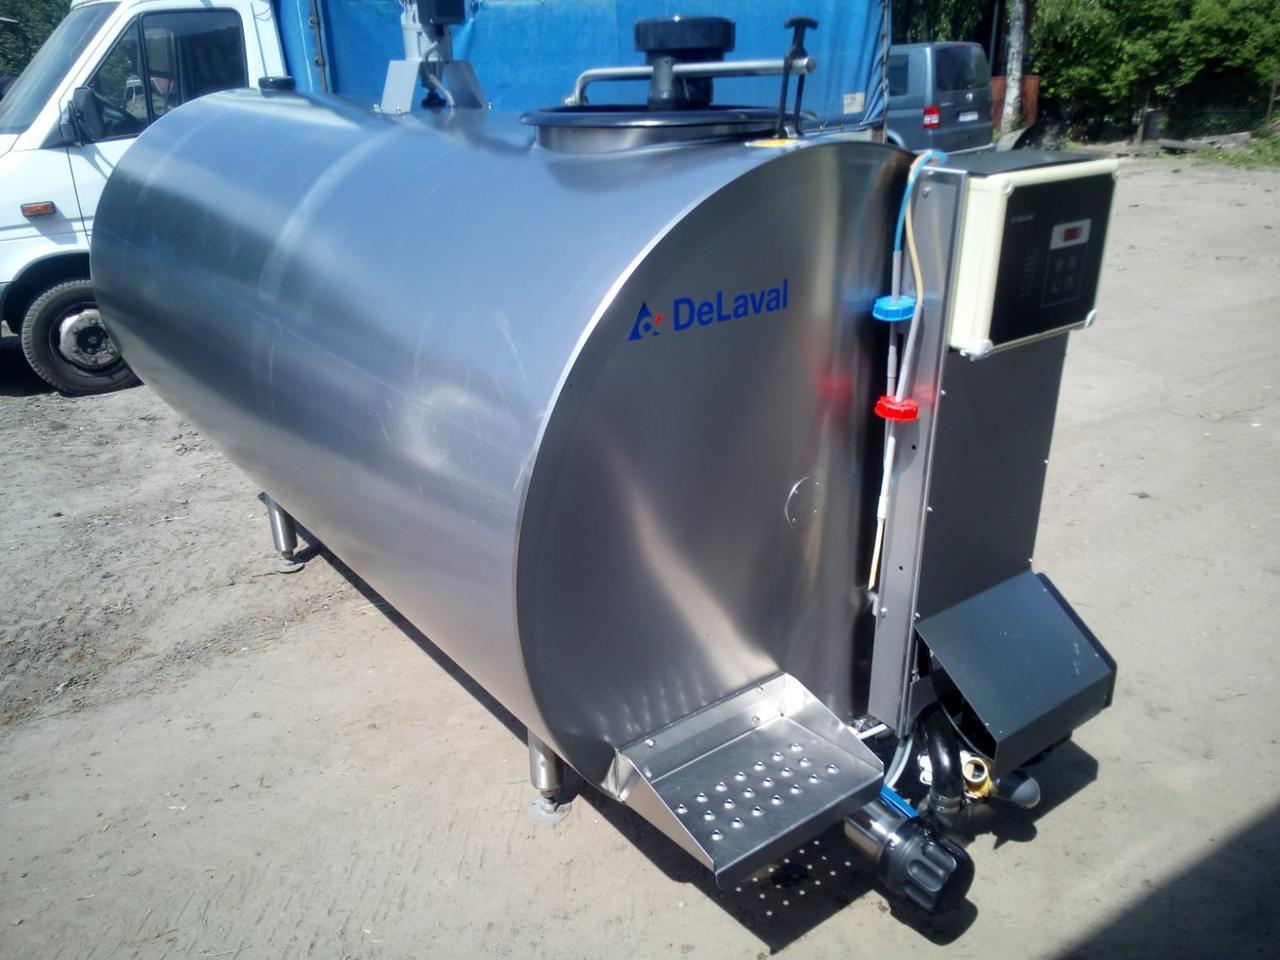 Охладители молока DeLaval. Модель DX/CR. Характеристики и описание.